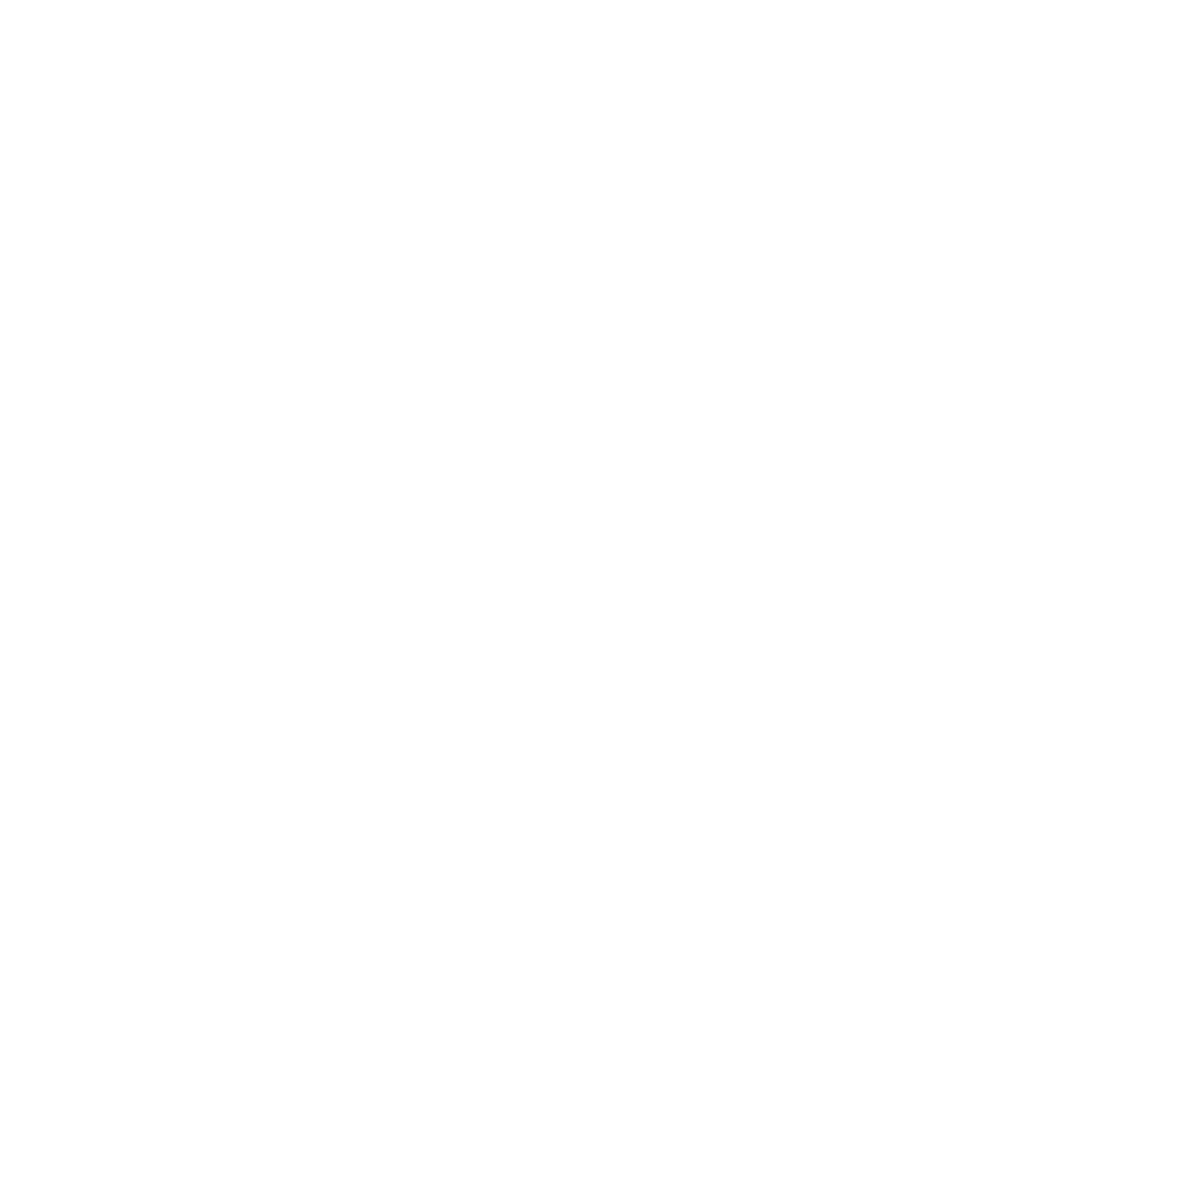 social security icon